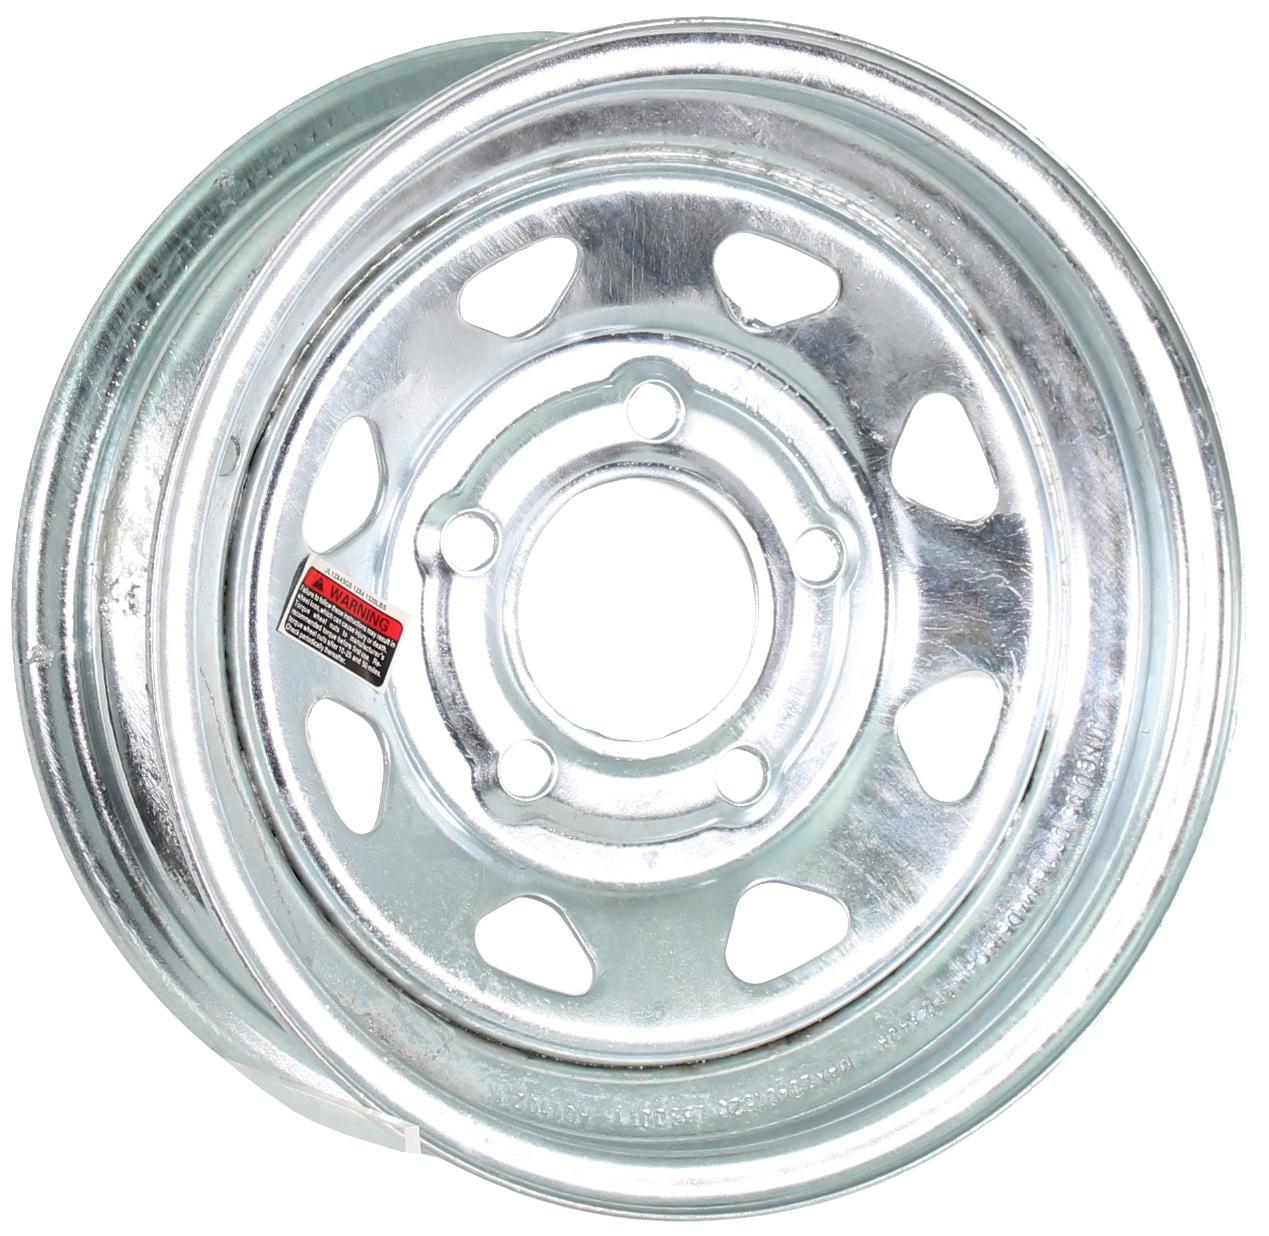 12x4 5-Lug Galvanized Spoke Steel Trailer Wheel Image